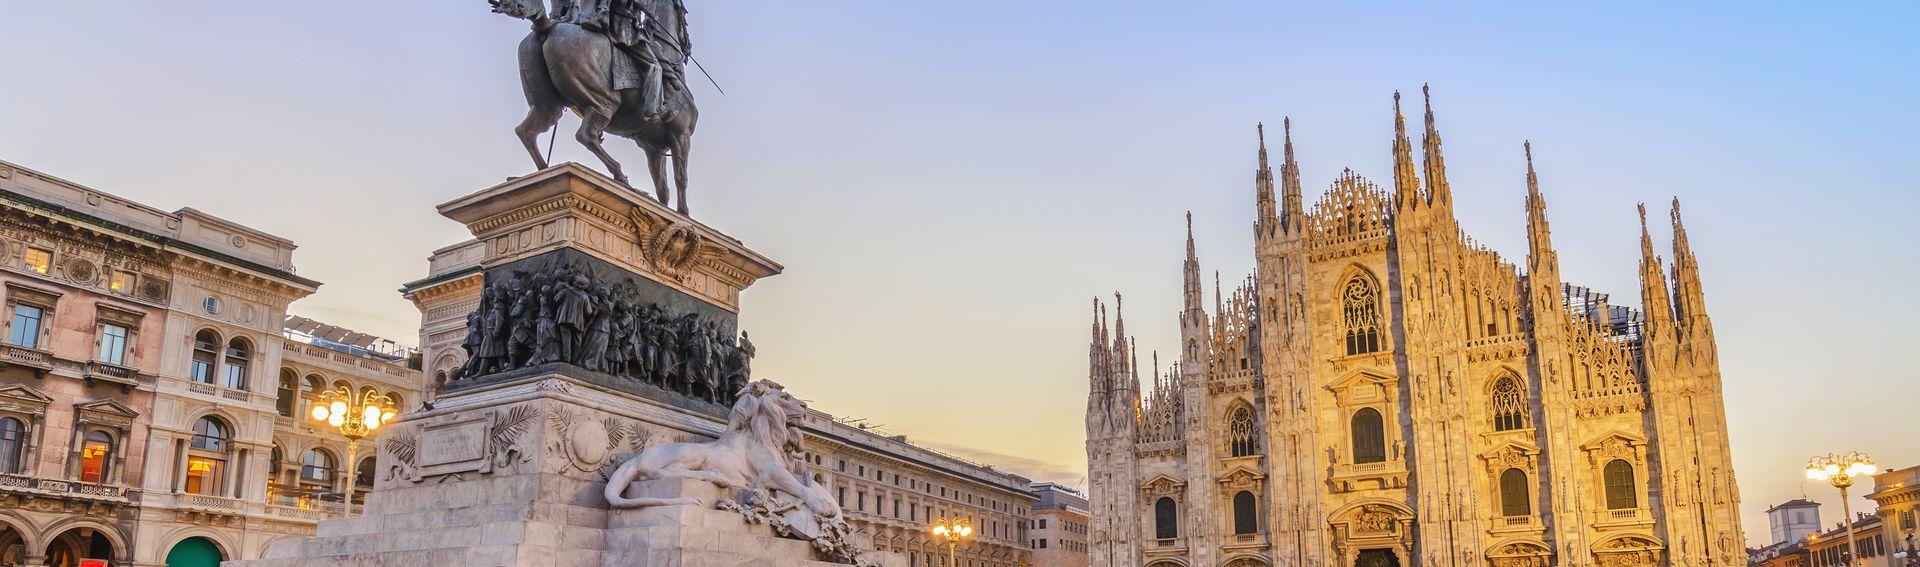 Provinz Mailand